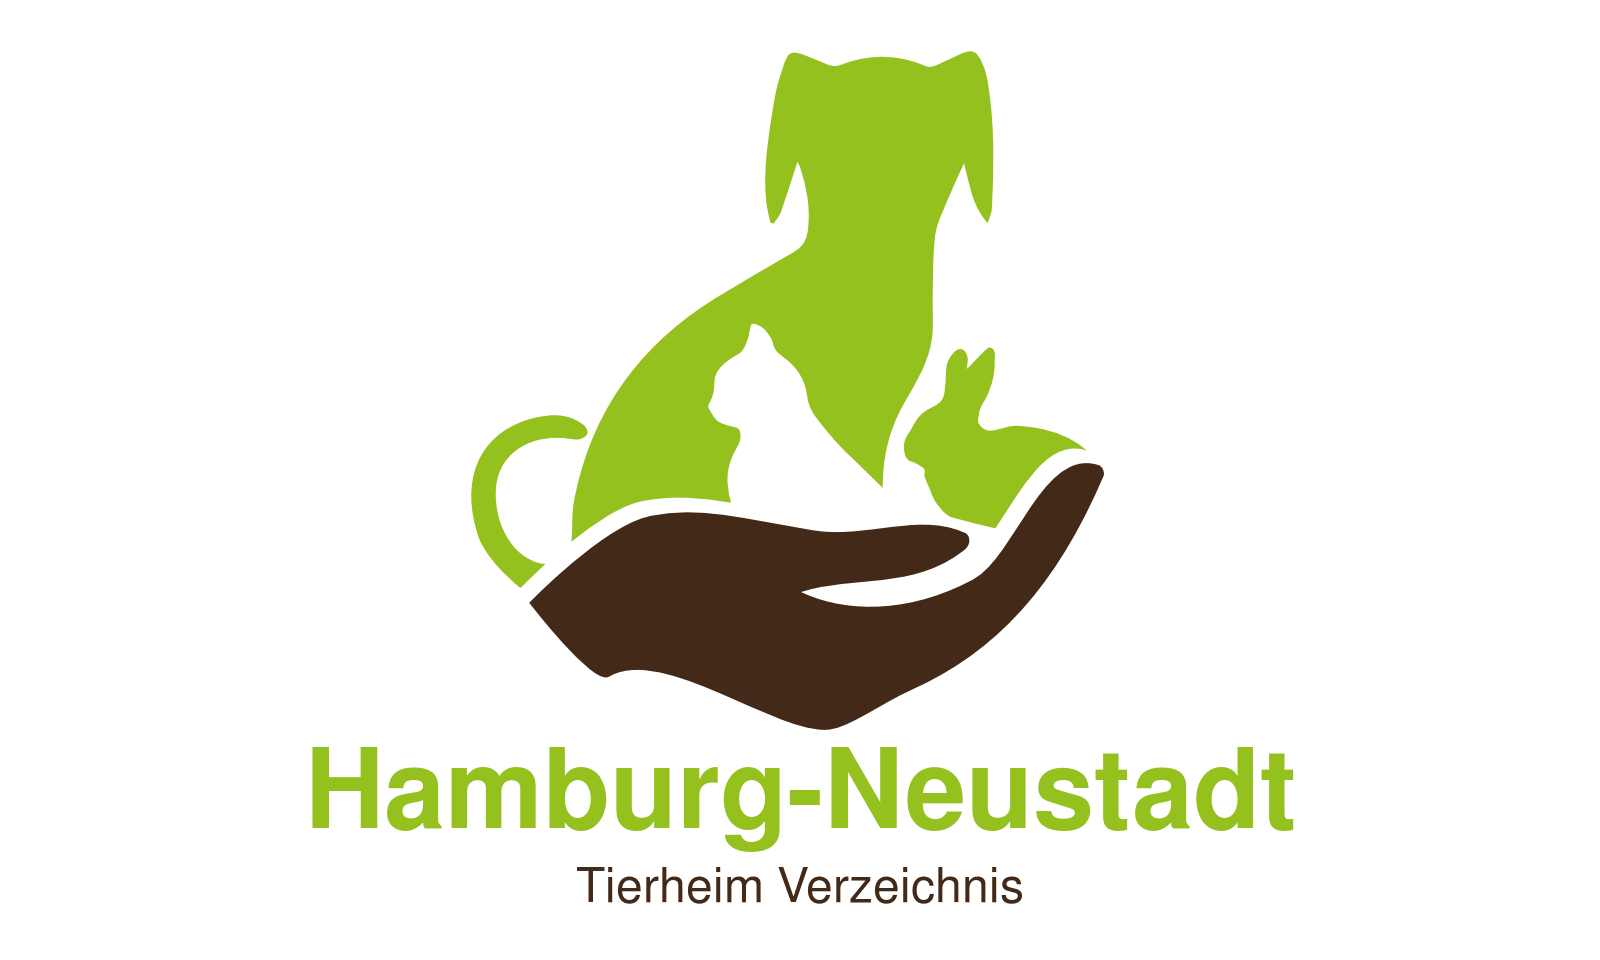 Tierheim Hamburg Neustadt